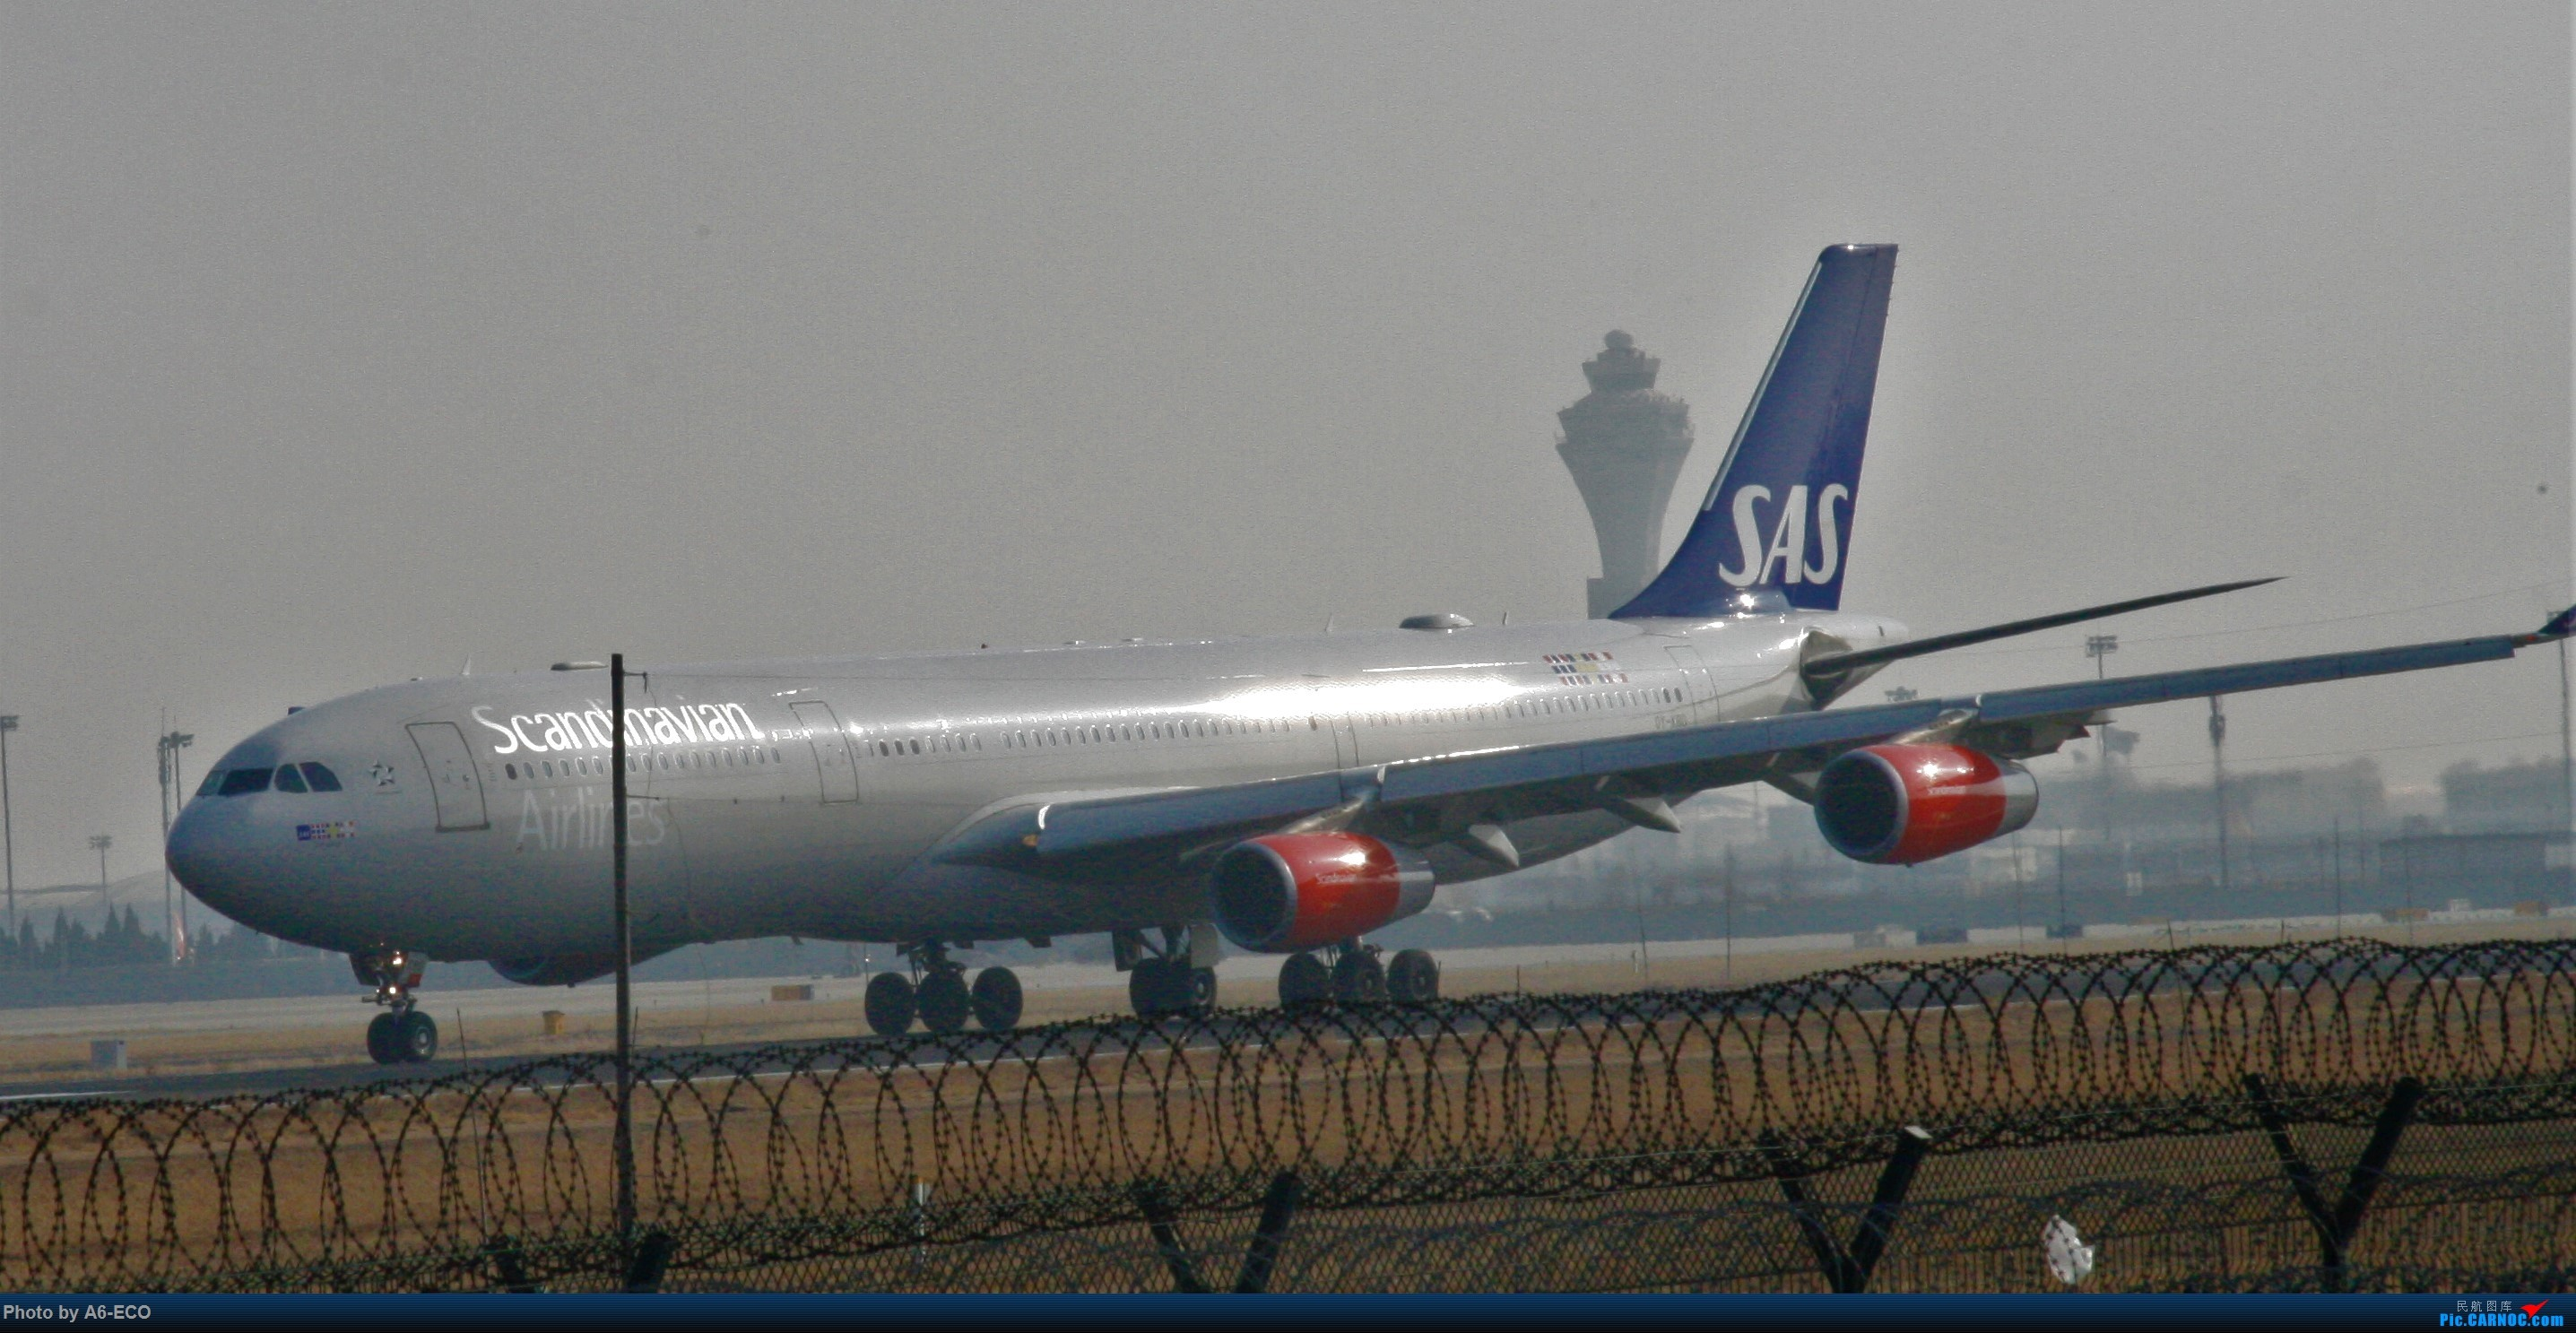 Re:[原创]今天运气极好,云南孔雀,B-1070,2个菜航邮戳,泡菜航彩绘,东航邮戳...... AIRBUS A340-300 OY-KBD 中国北京首都国际机场